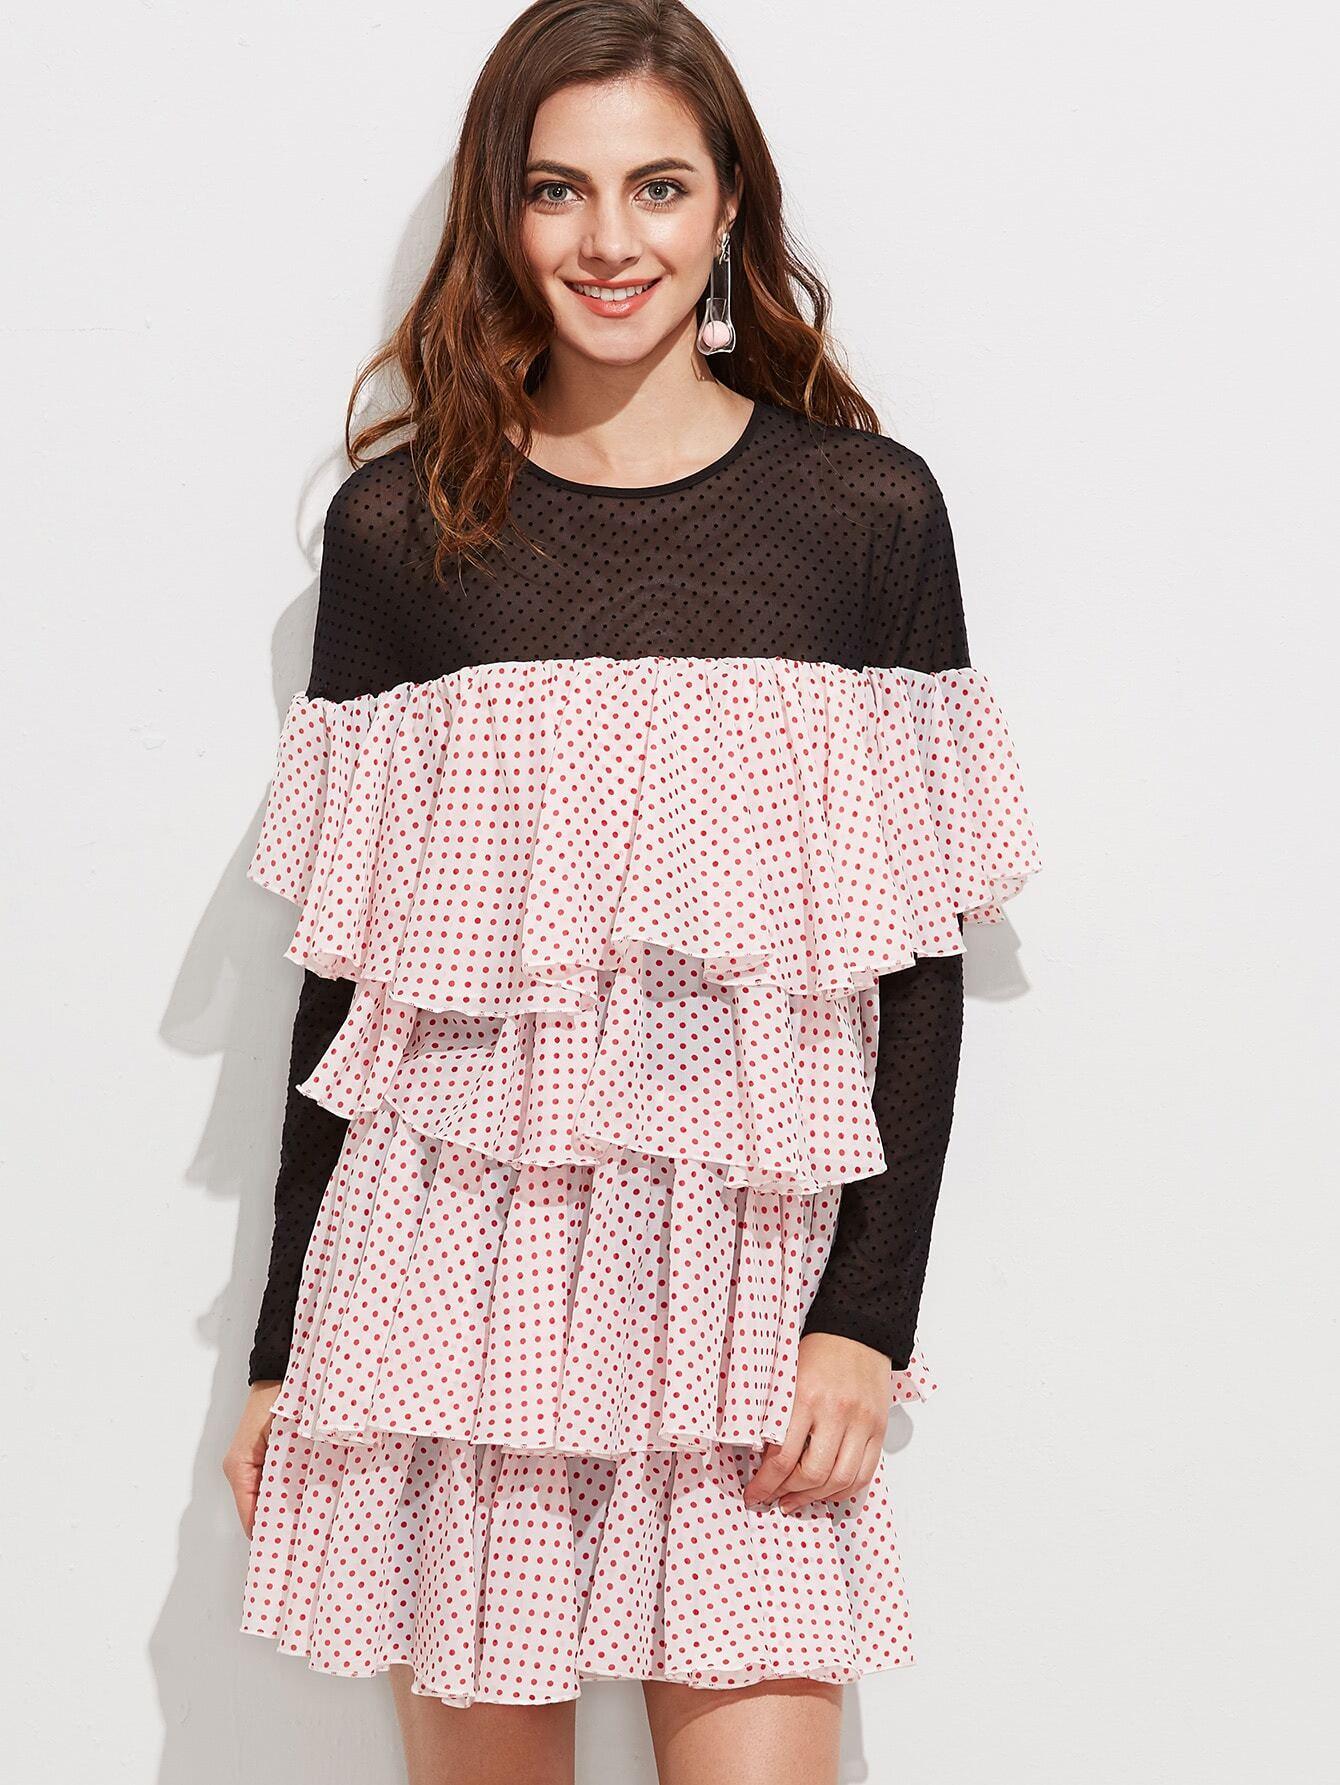 Contrast Sheer Shoulder And Sleeve Polka Dot Layered Ruffle Dress burgundy contrast sheer neck layered sleeve ruffle dress